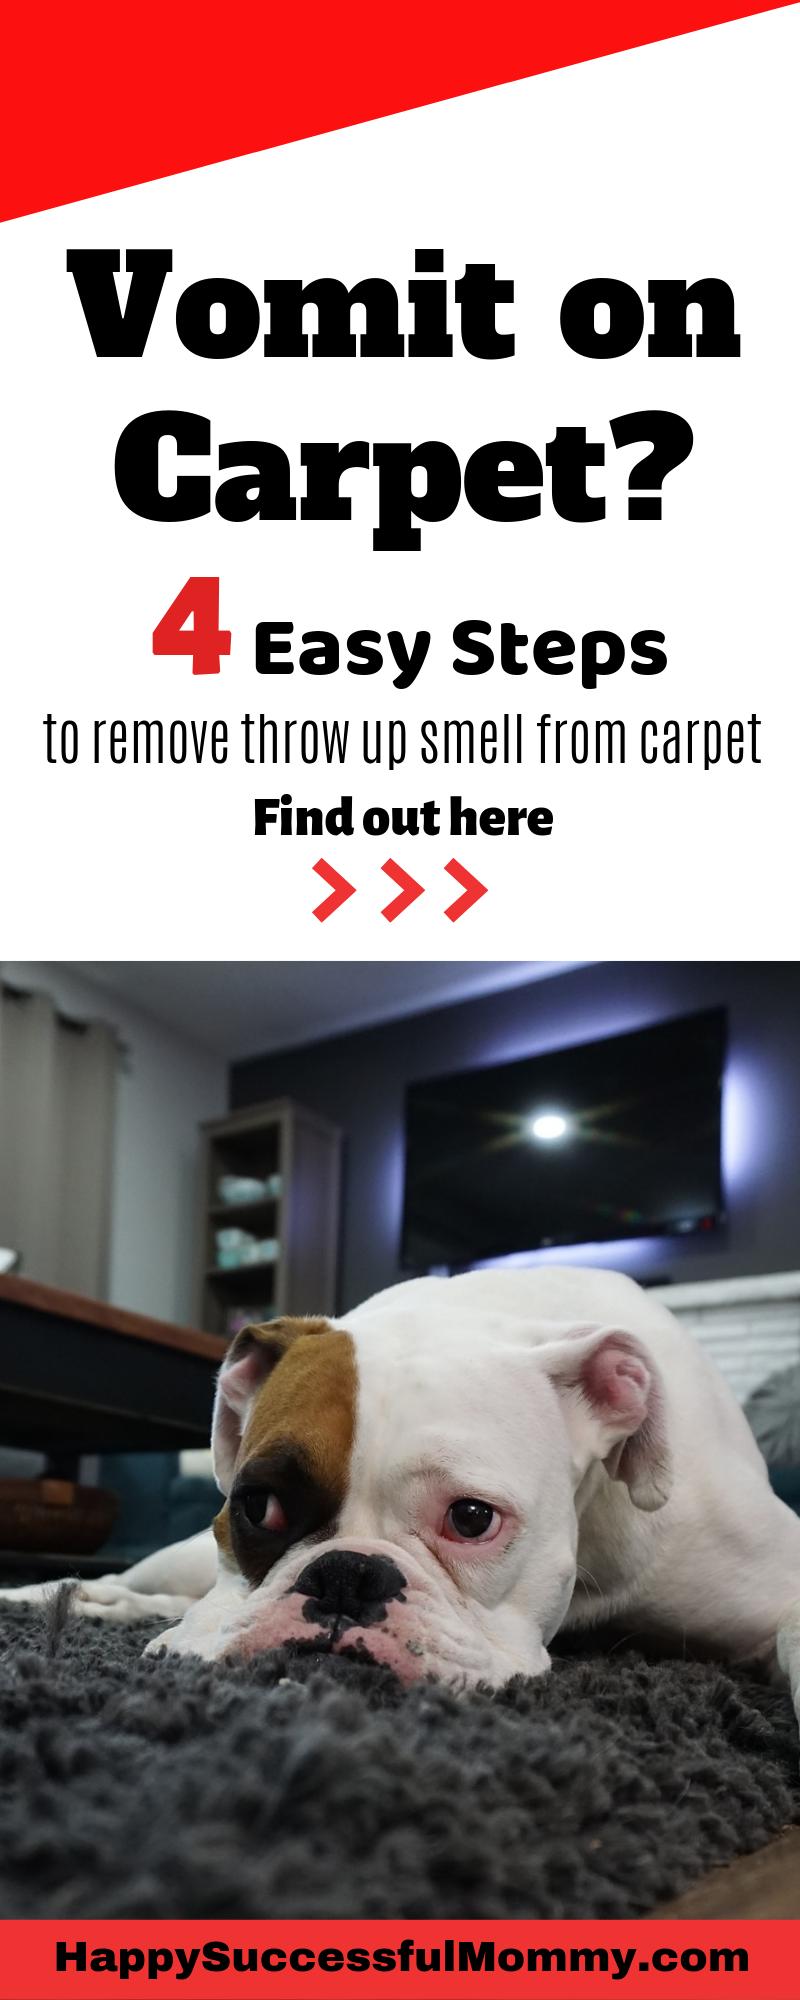 Vomit Smell In Carpet Carpet Odor Remover How To Clean Carpet Carpet Odors